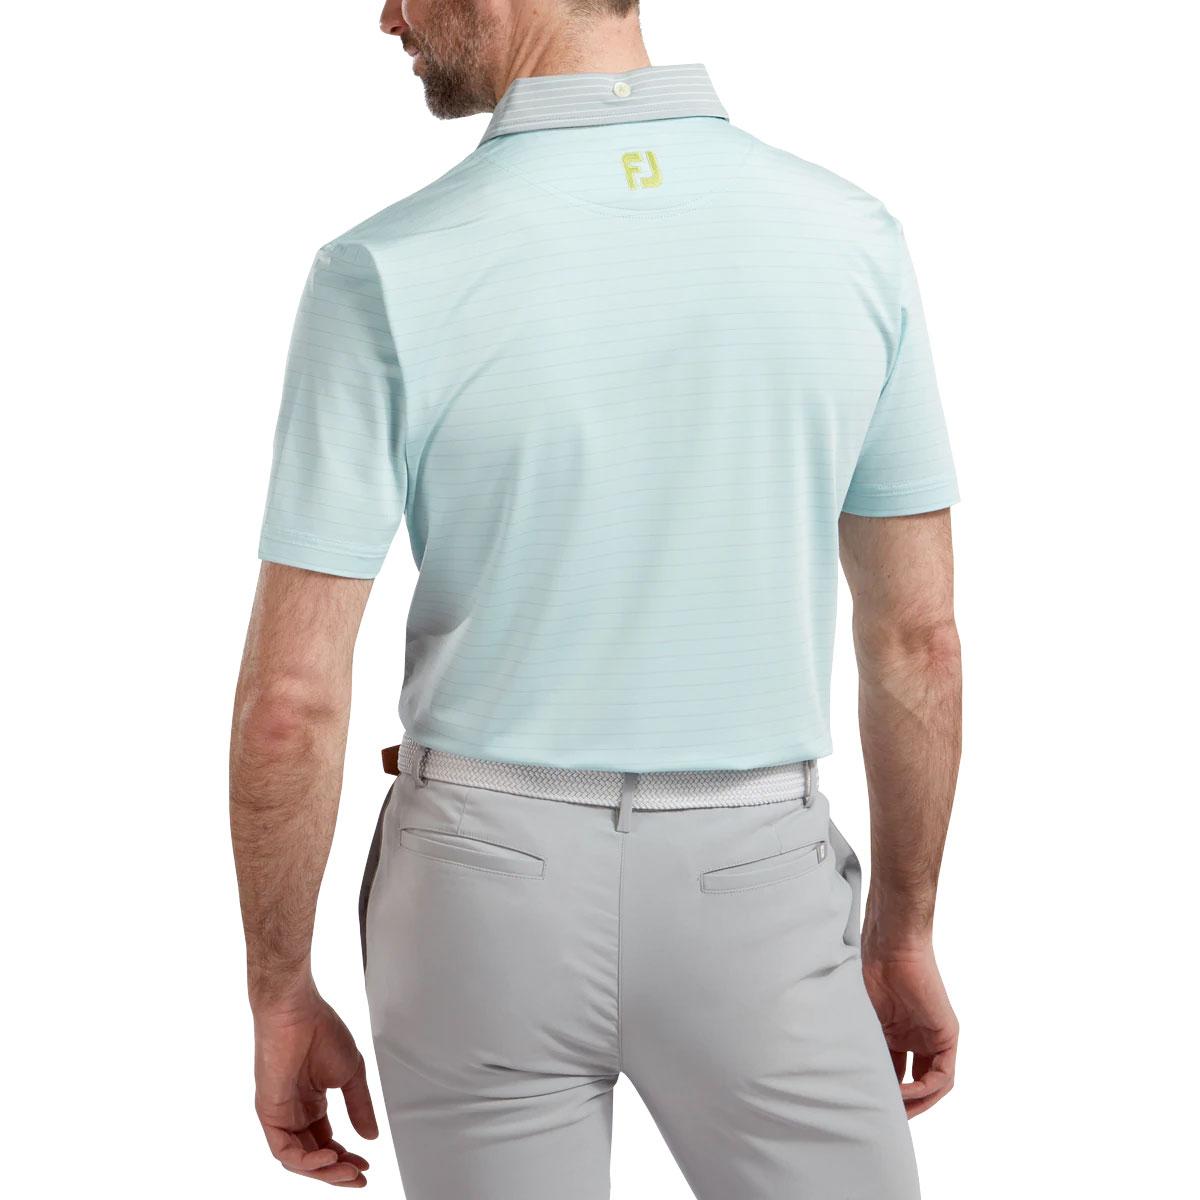 FootJoy Lisle Pinstripe Mix Mens Golf Polo Shirt